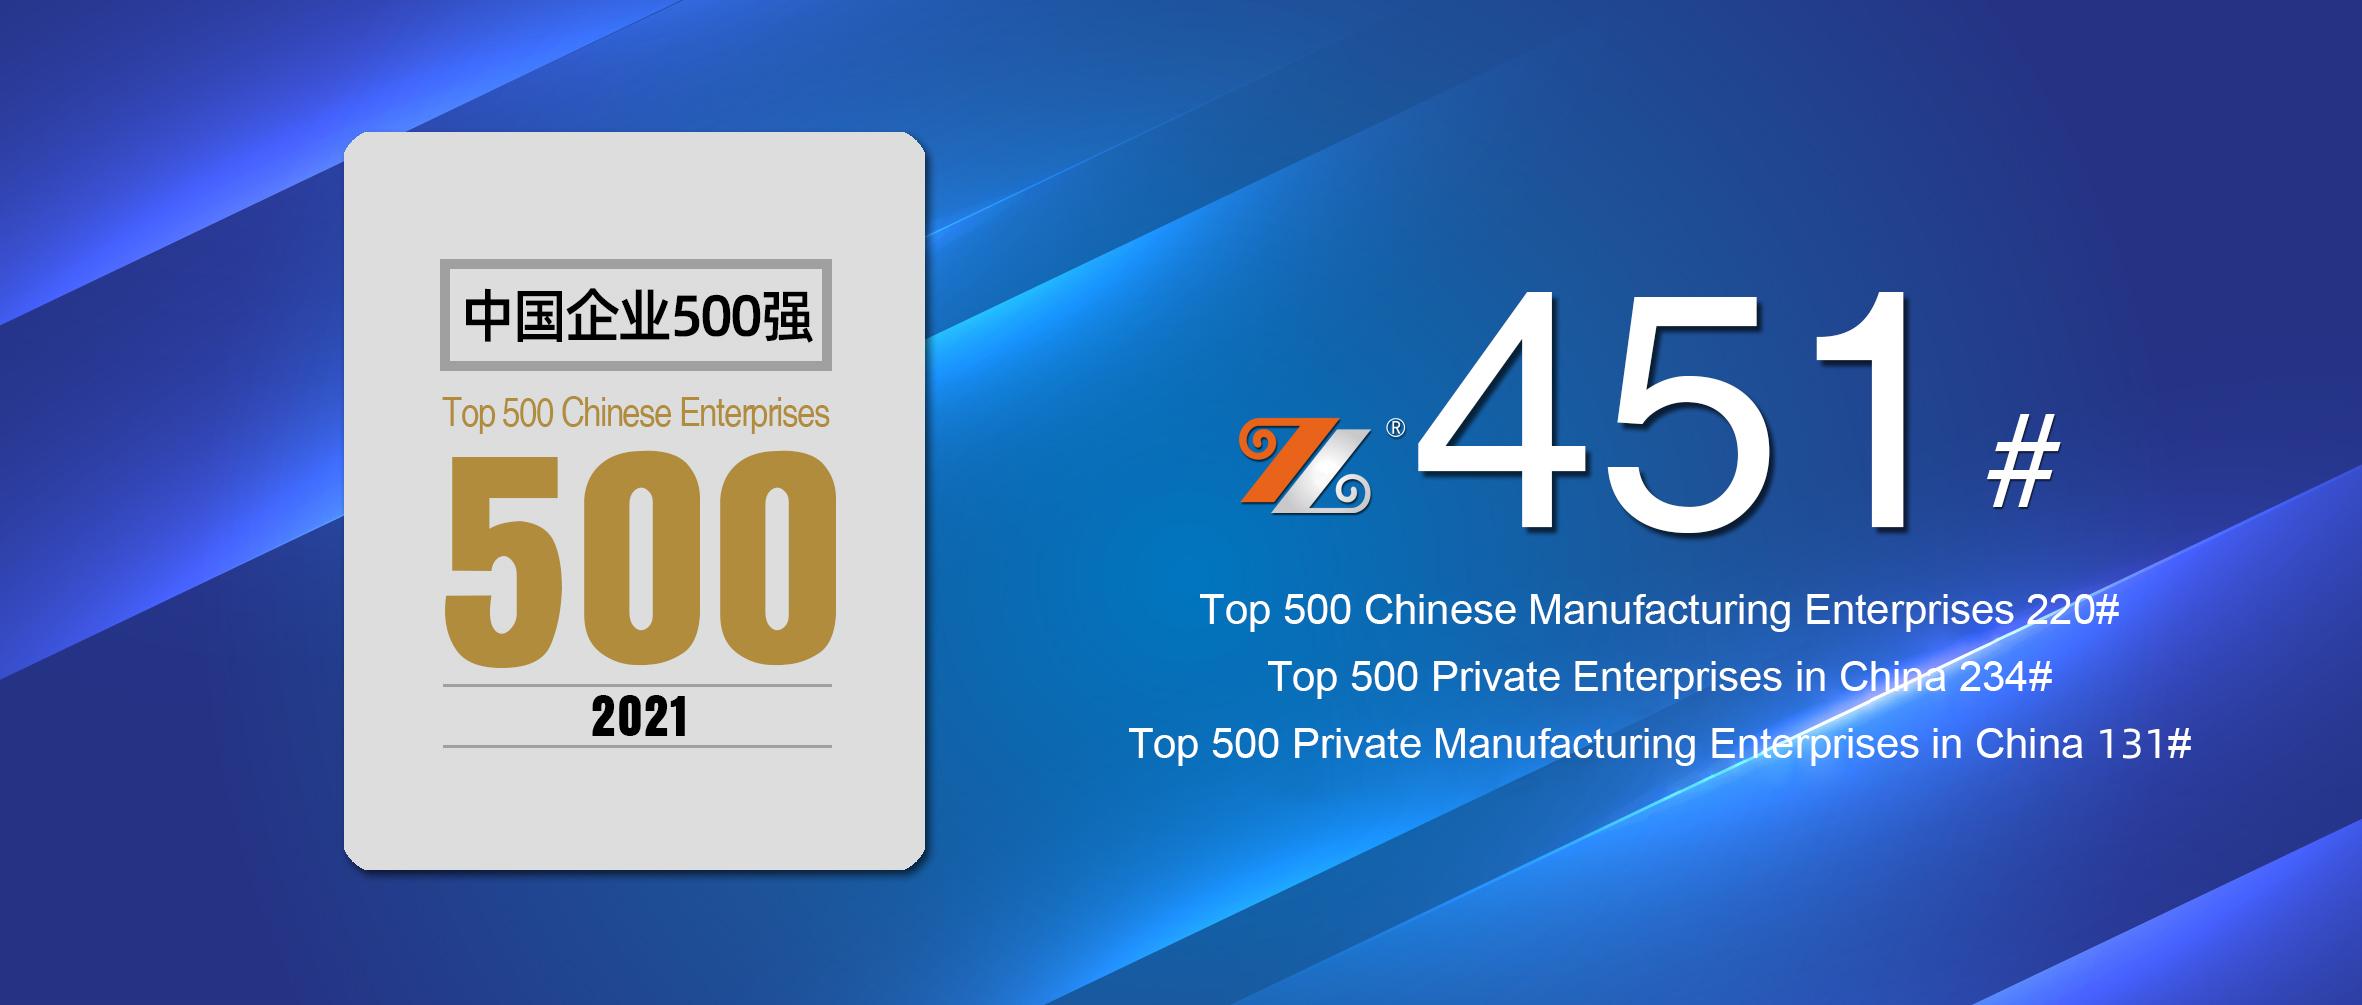 Hongwang Holding Group ranks 451st in the 2021 Top 500 Chinese Enterprises